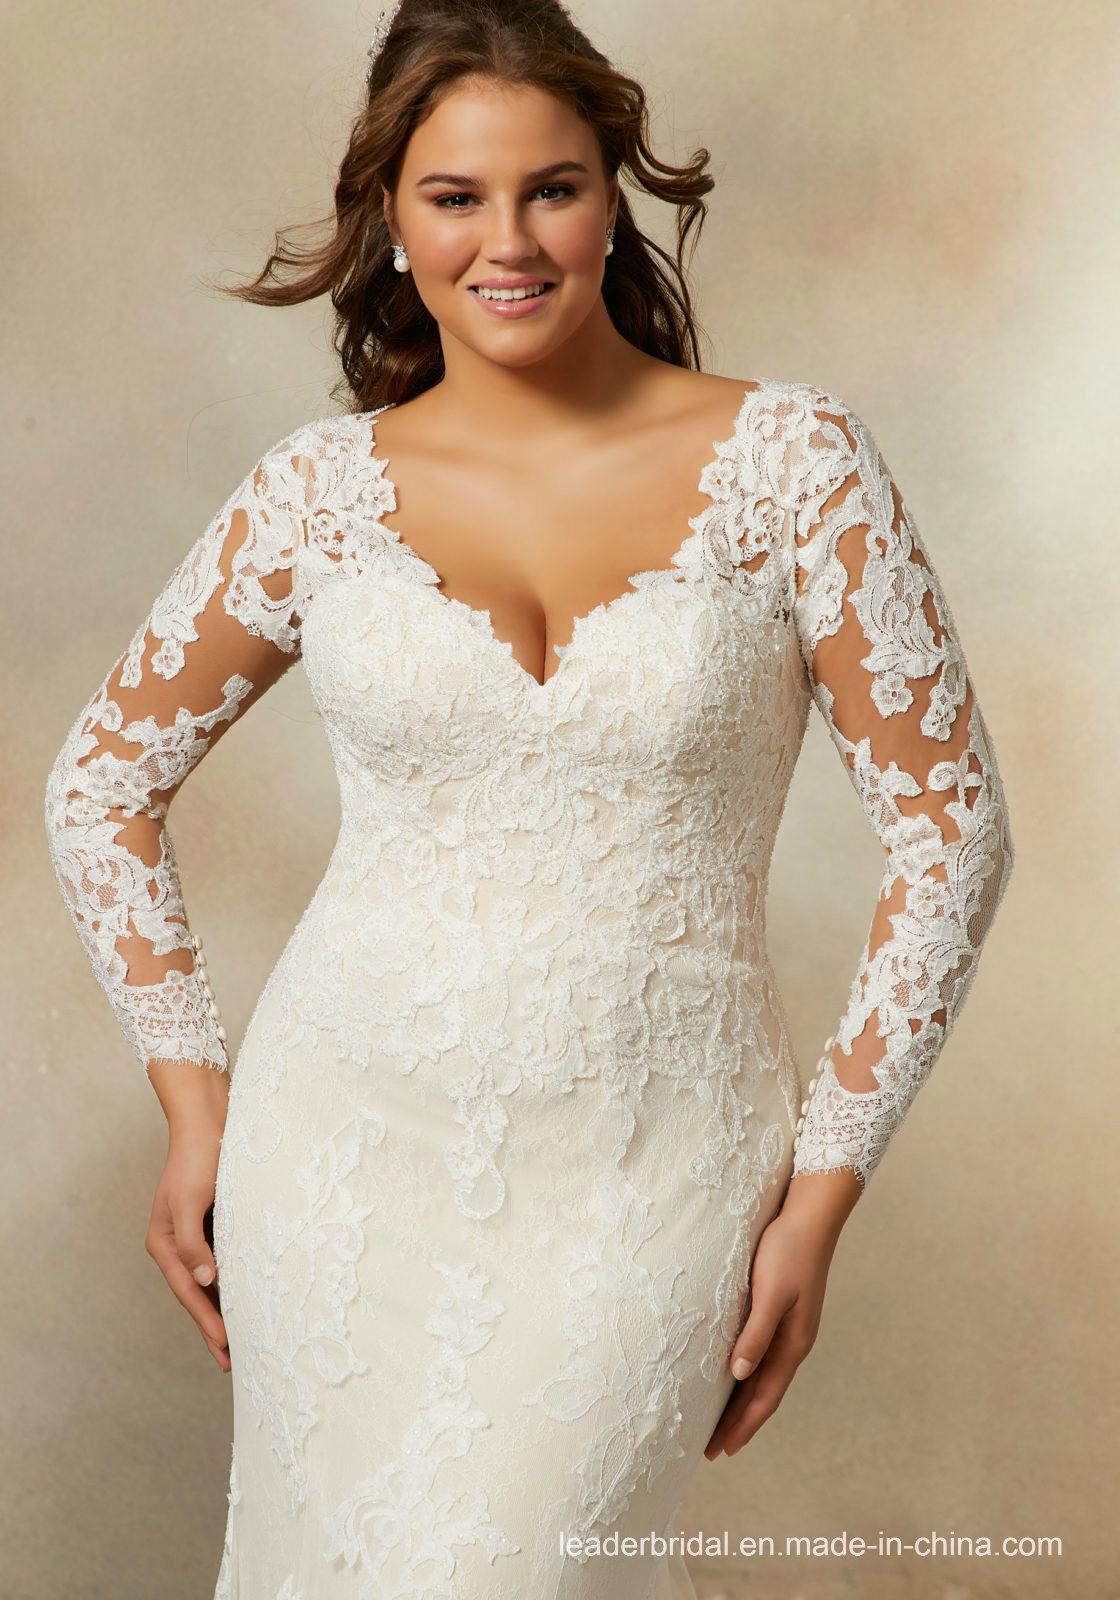 7a02676cb6f Plus Size Long Sleeve Mermaid Wedding Dresses - Gomes Weine AG